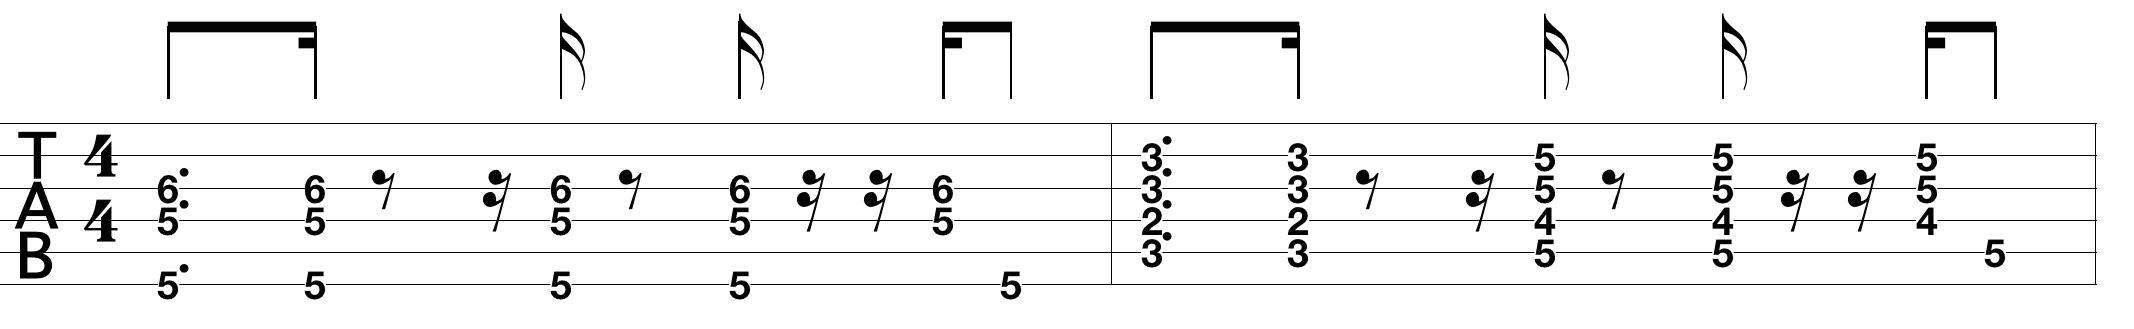 blues-guitar-lessons-online_1.png